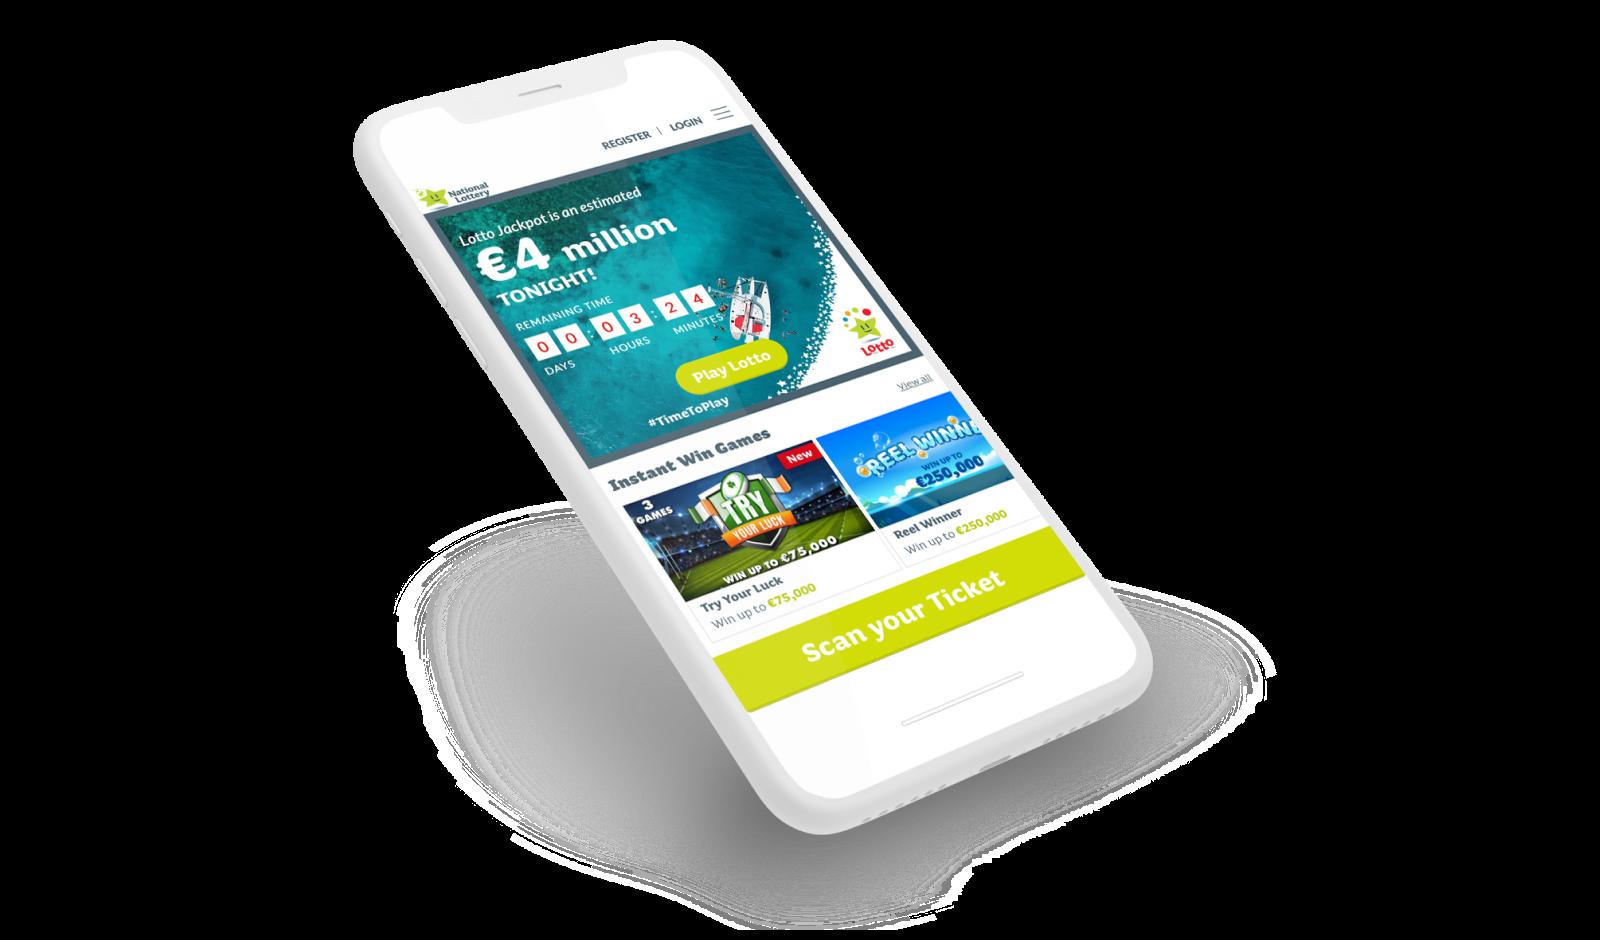 RTEjr App by Marino Software